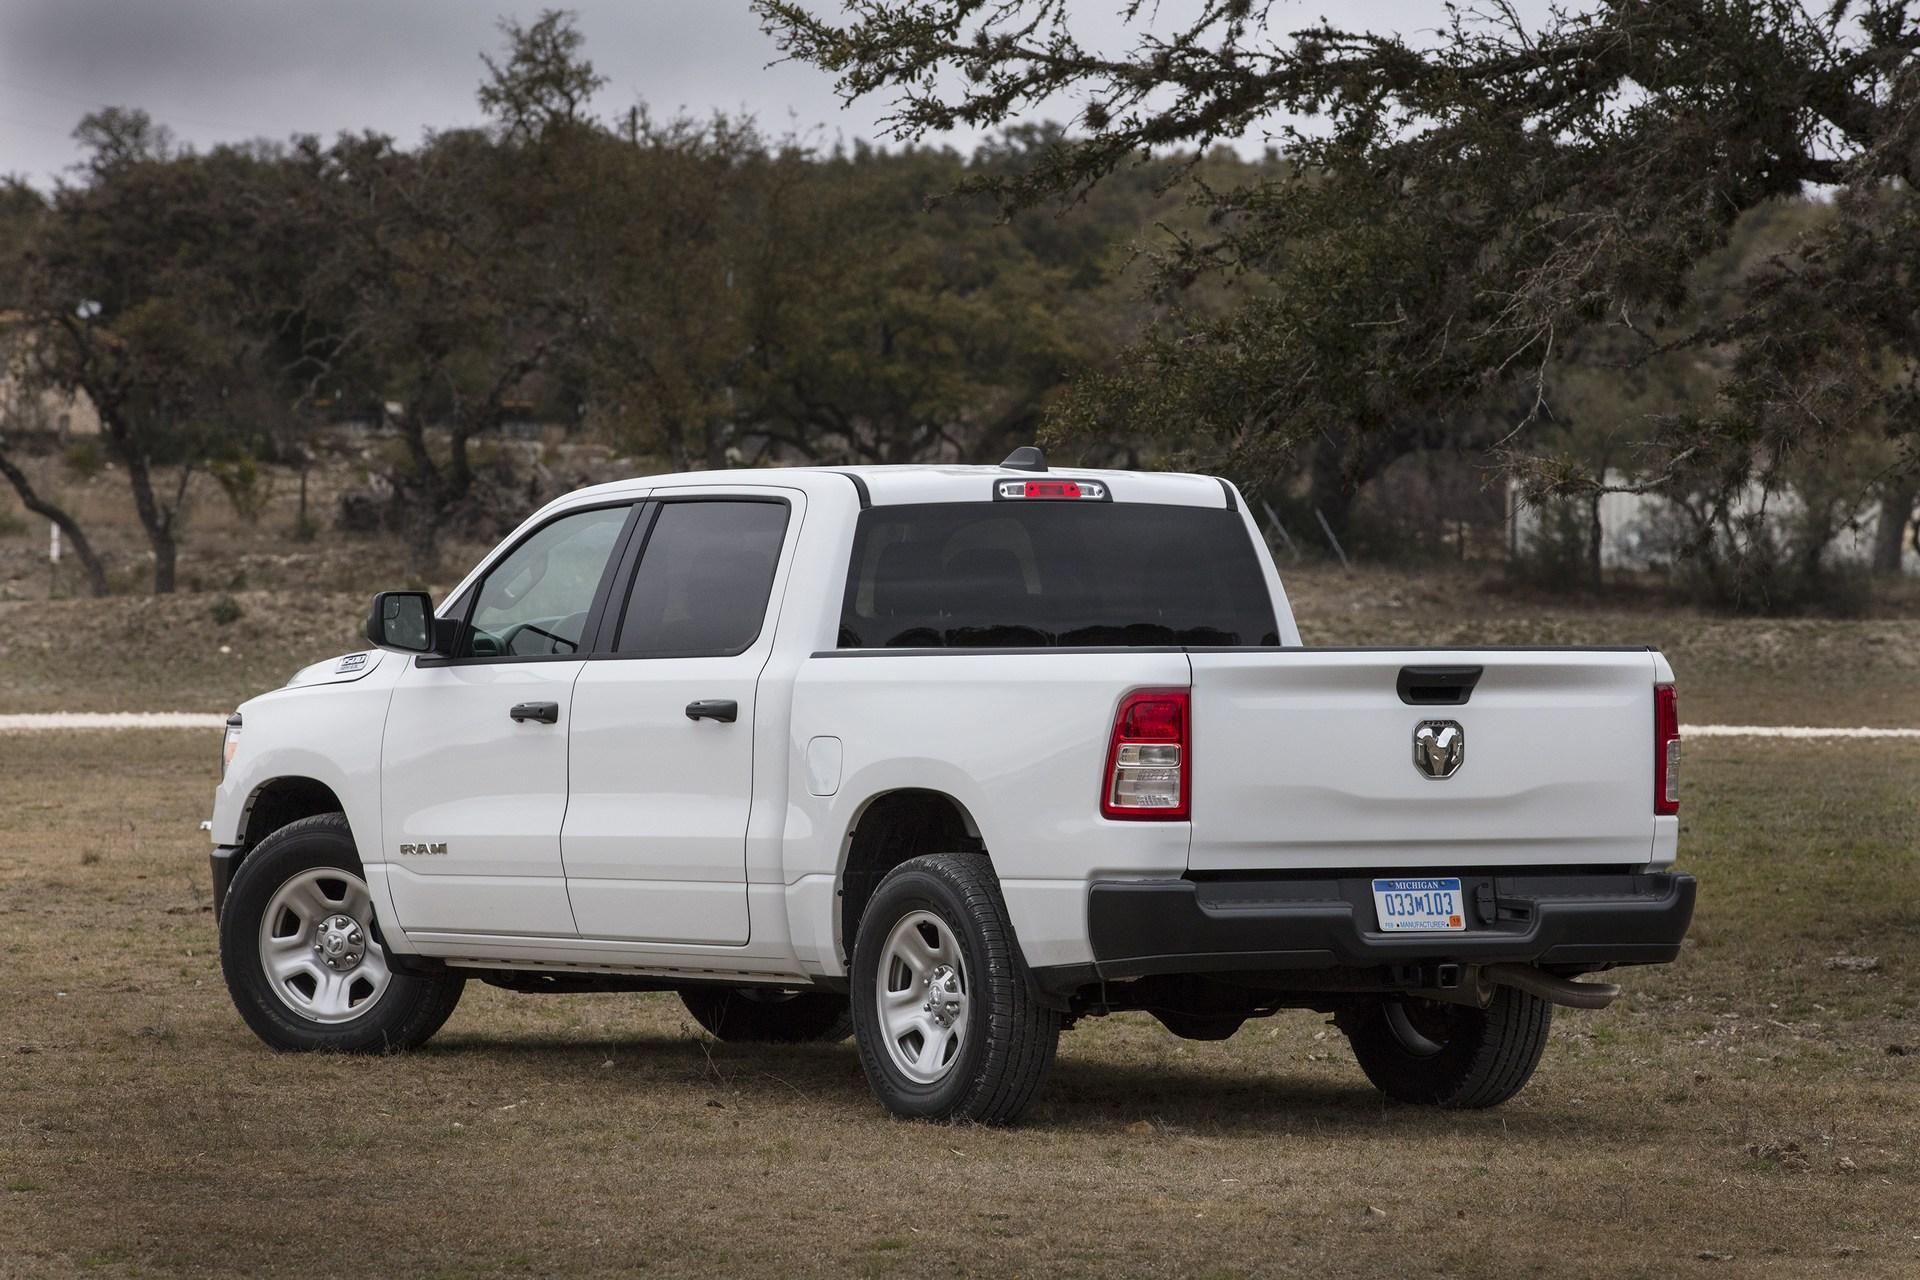 Pickup Truck Comparison Test: 2019 Ram 1500 vs  Chevy